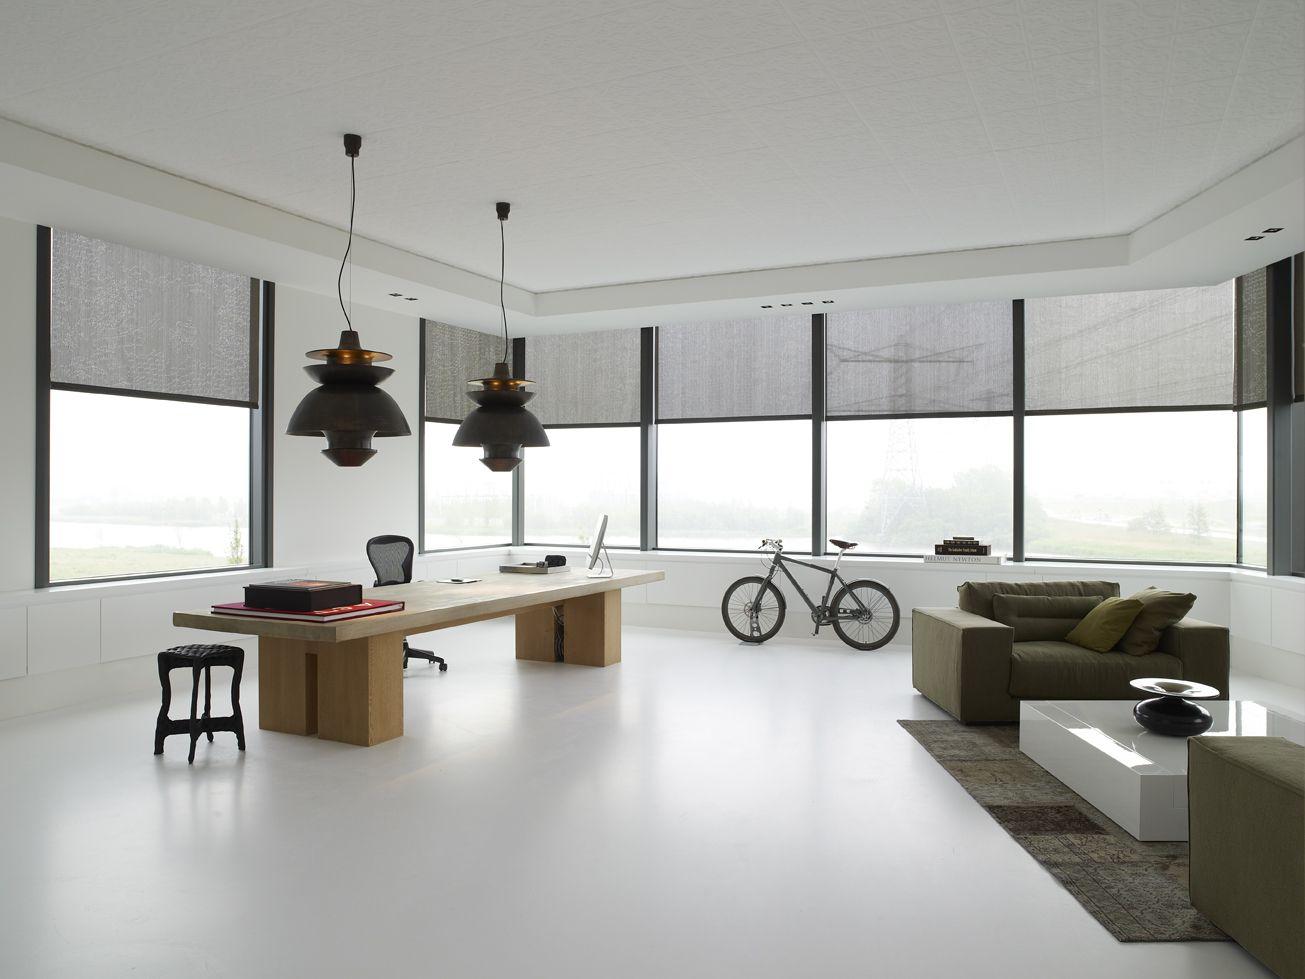 Piet Boon Vloeren : Piet boon styling by karin meyn the piet boon office great